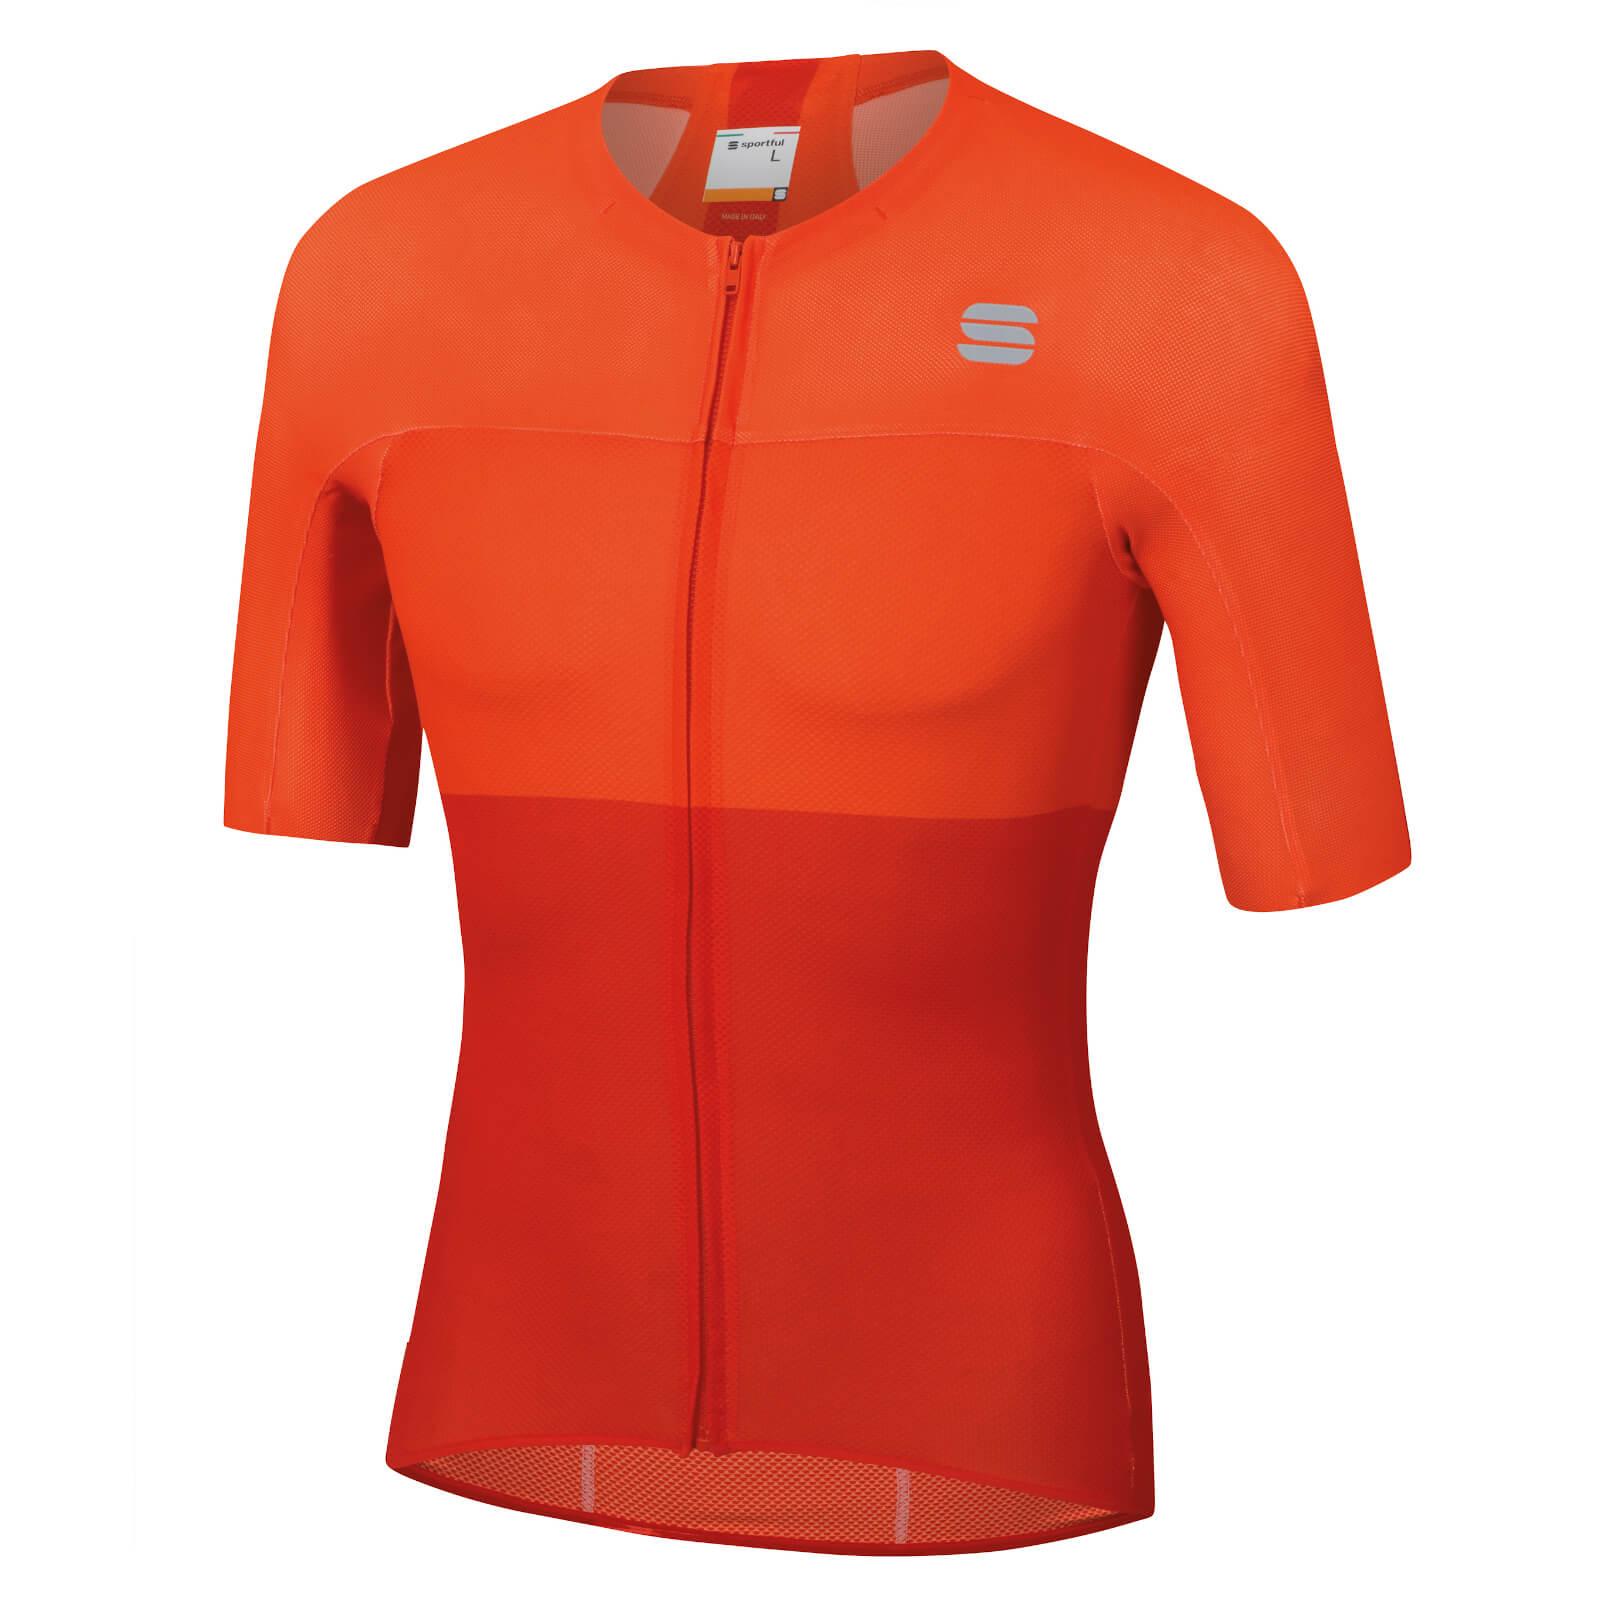 Sportful BodyFit Pro Light Jersey - XL - Fire Red/Orange SDR